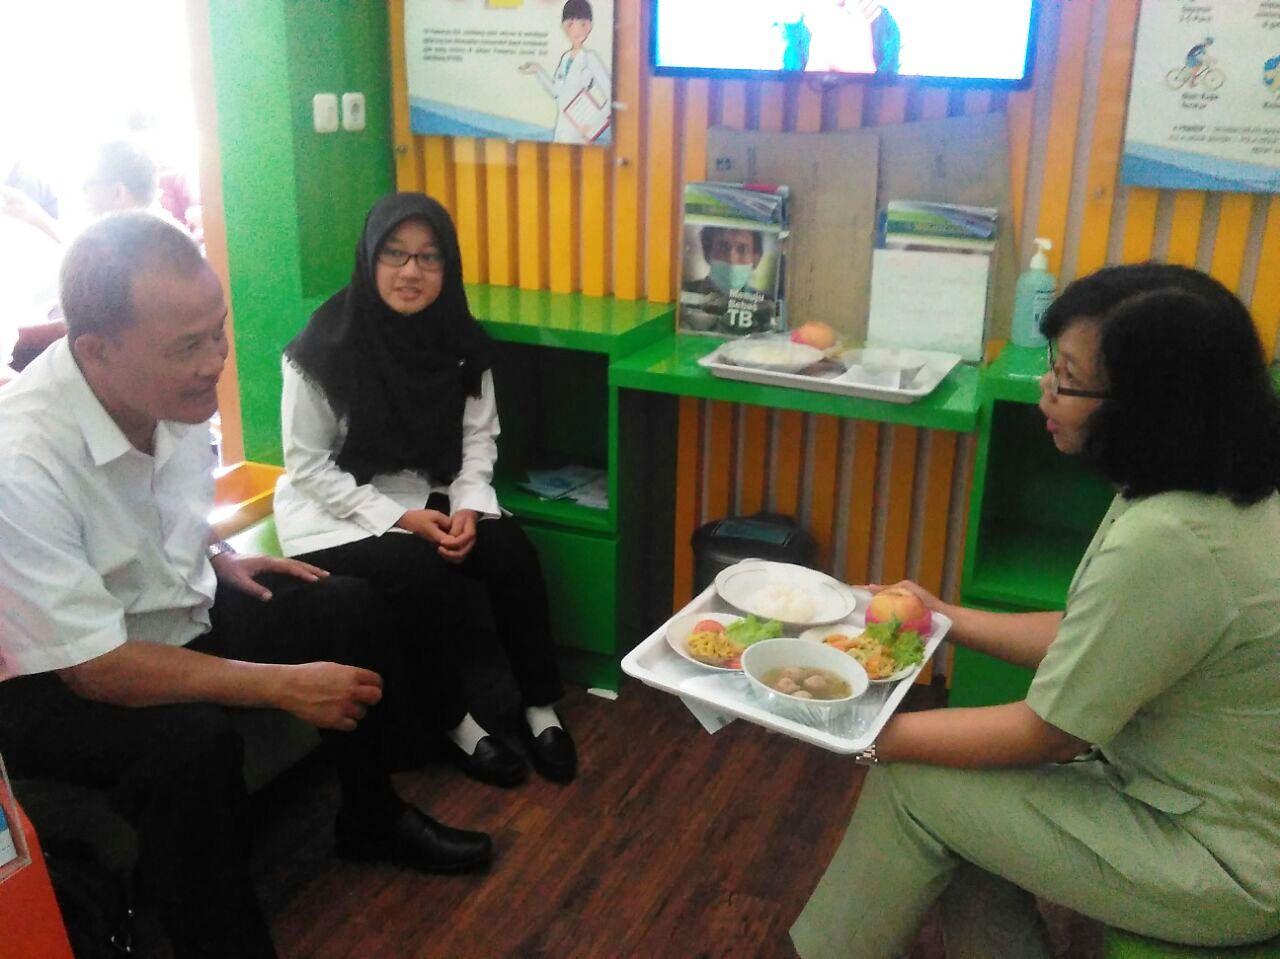 PKRS di Rawat Jalan ( Healt Education Corner ) oleh Sulihjati, A. MG dengan tema Diet pada penderita